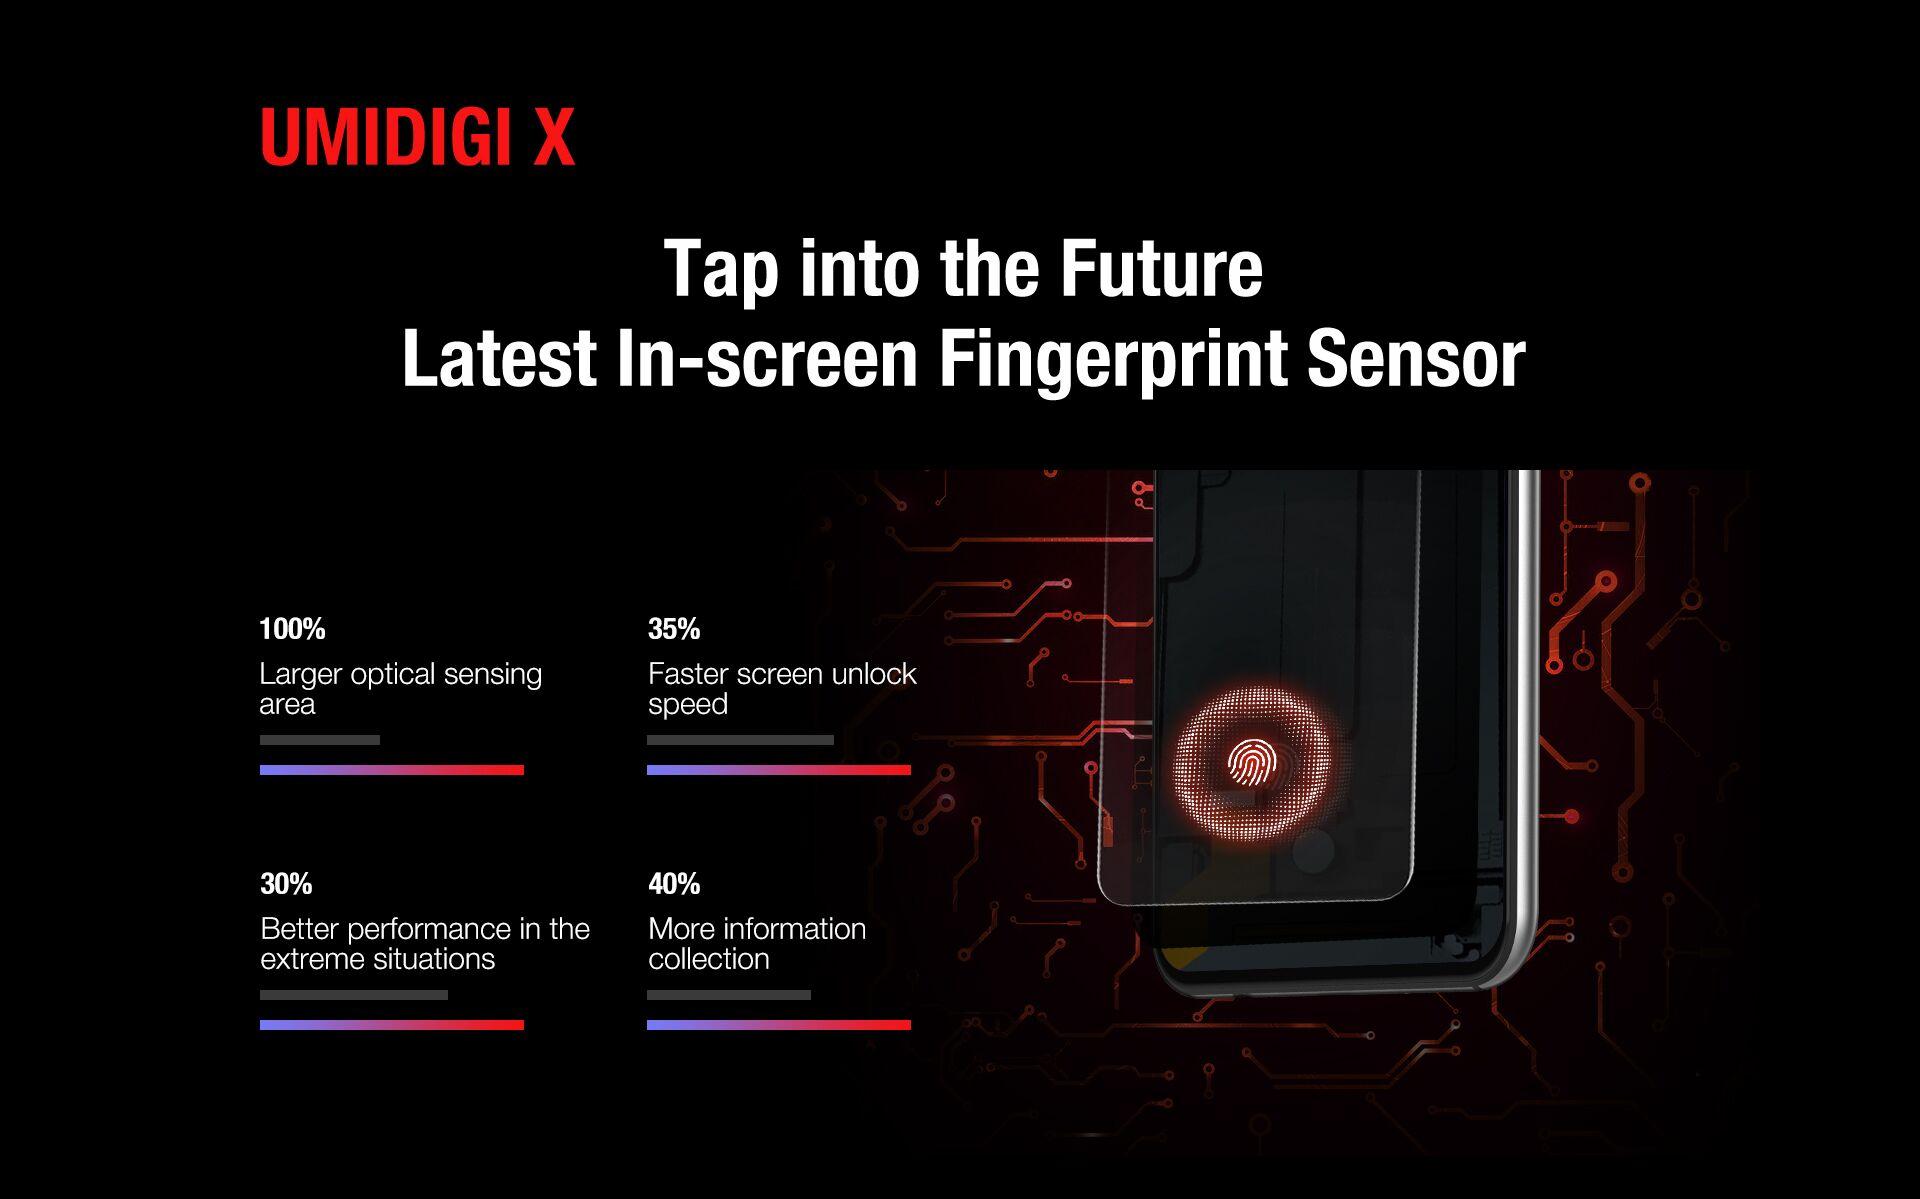 UMIDIGI X スペック詳細 Goodixの最新光学式ディスプレイ内指紋センサーを採用